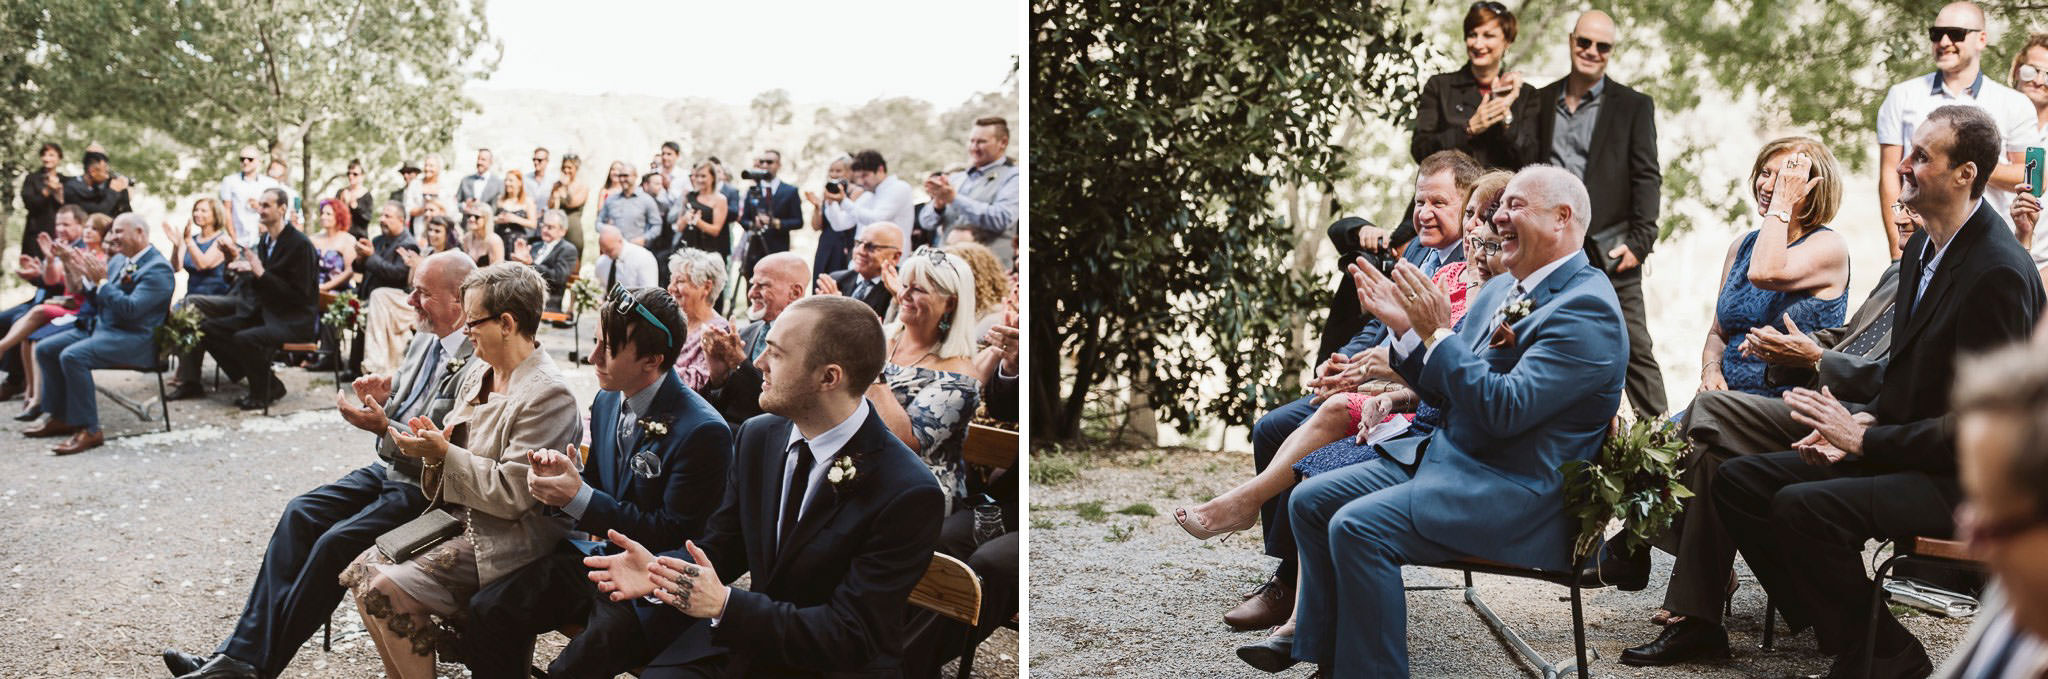 The Farm Yarra Valley Wedding Photography Ashleigh Haase-53.jpg